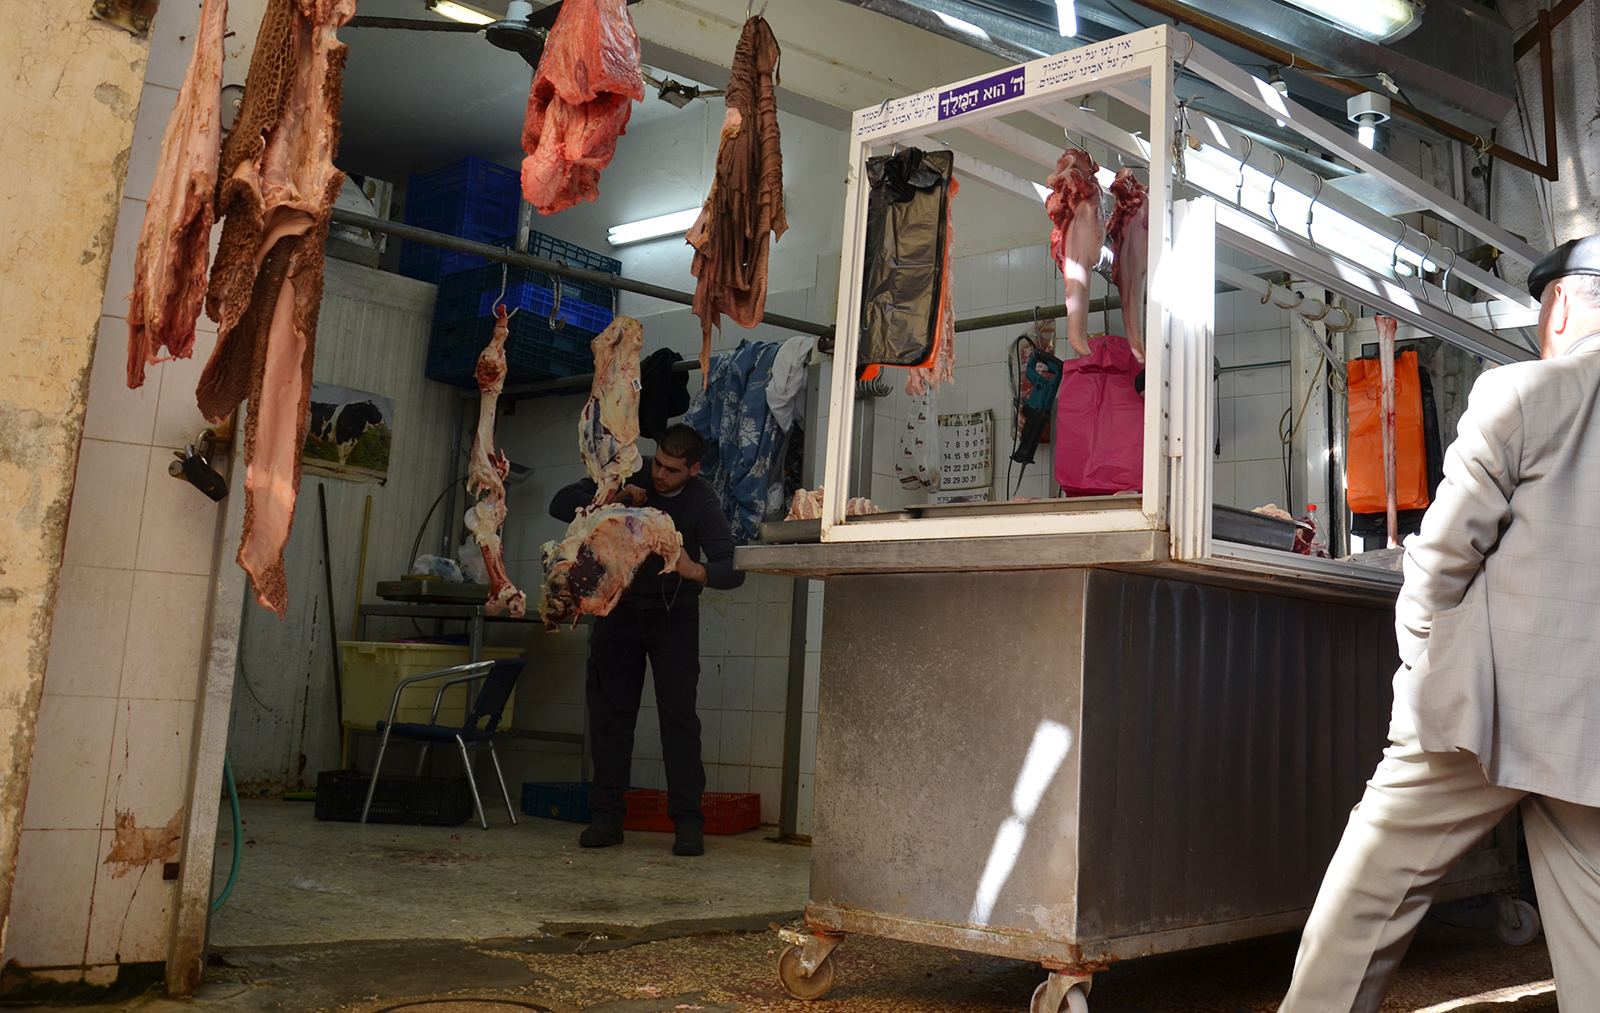 prodavač mas na Karmelském trhu, Tel-Aviv, Izrael